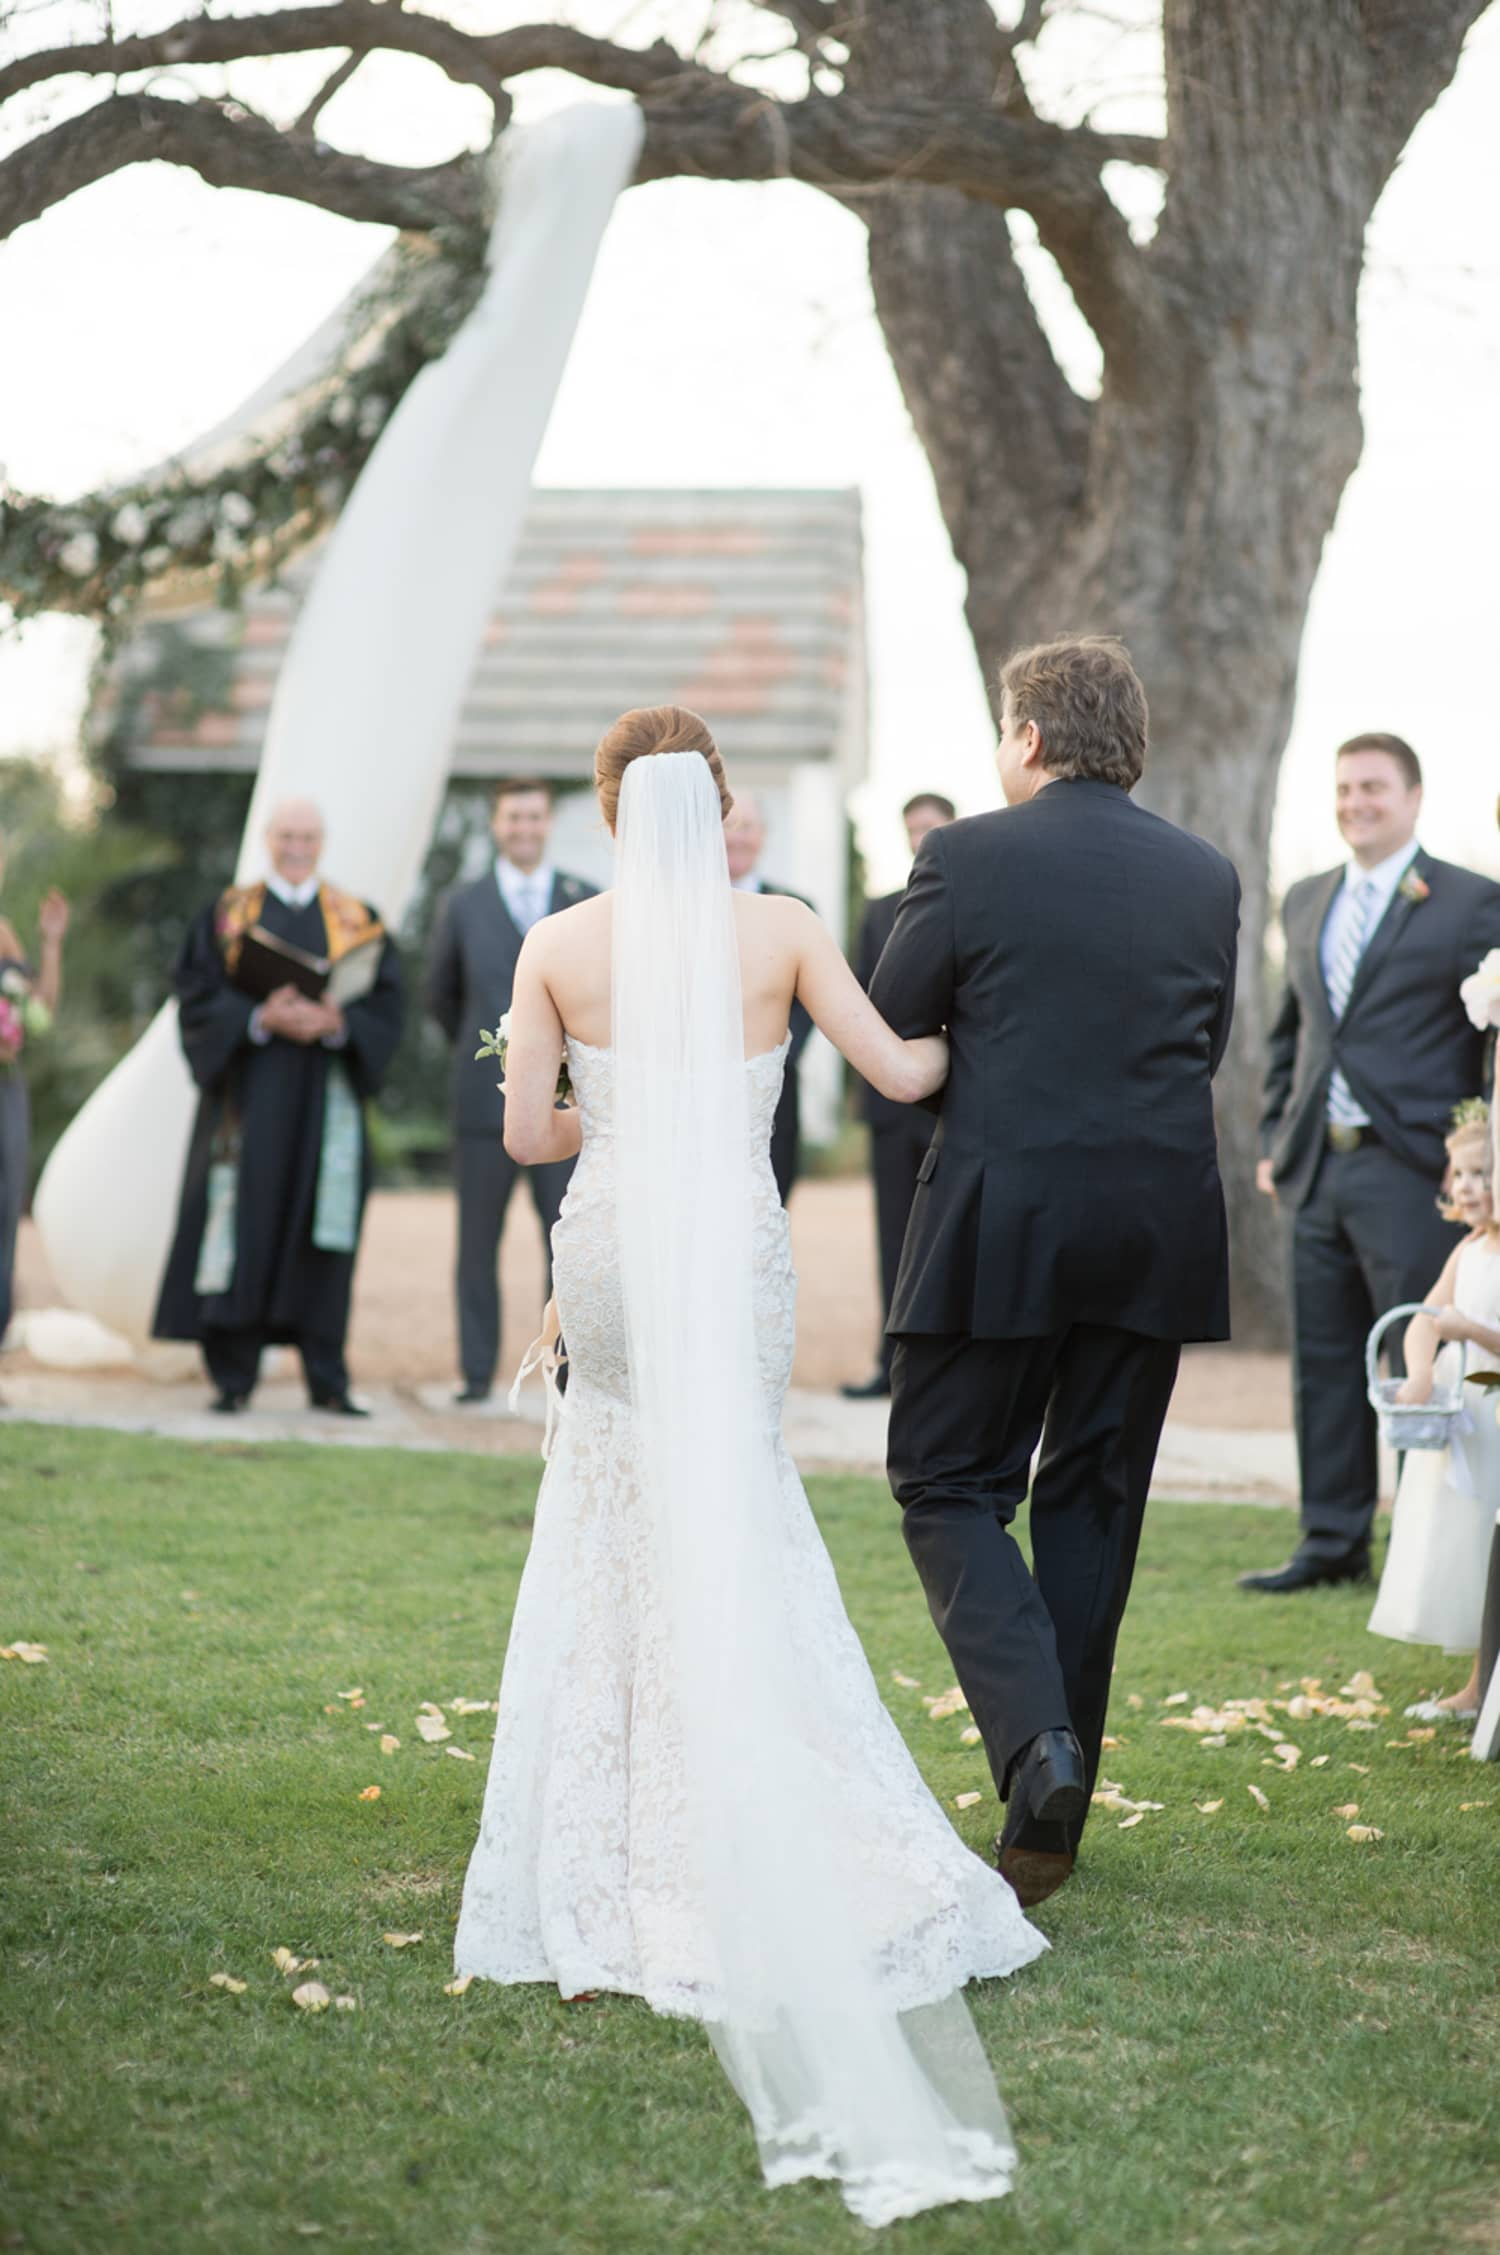 barr-mansion-wedding-23.jpg